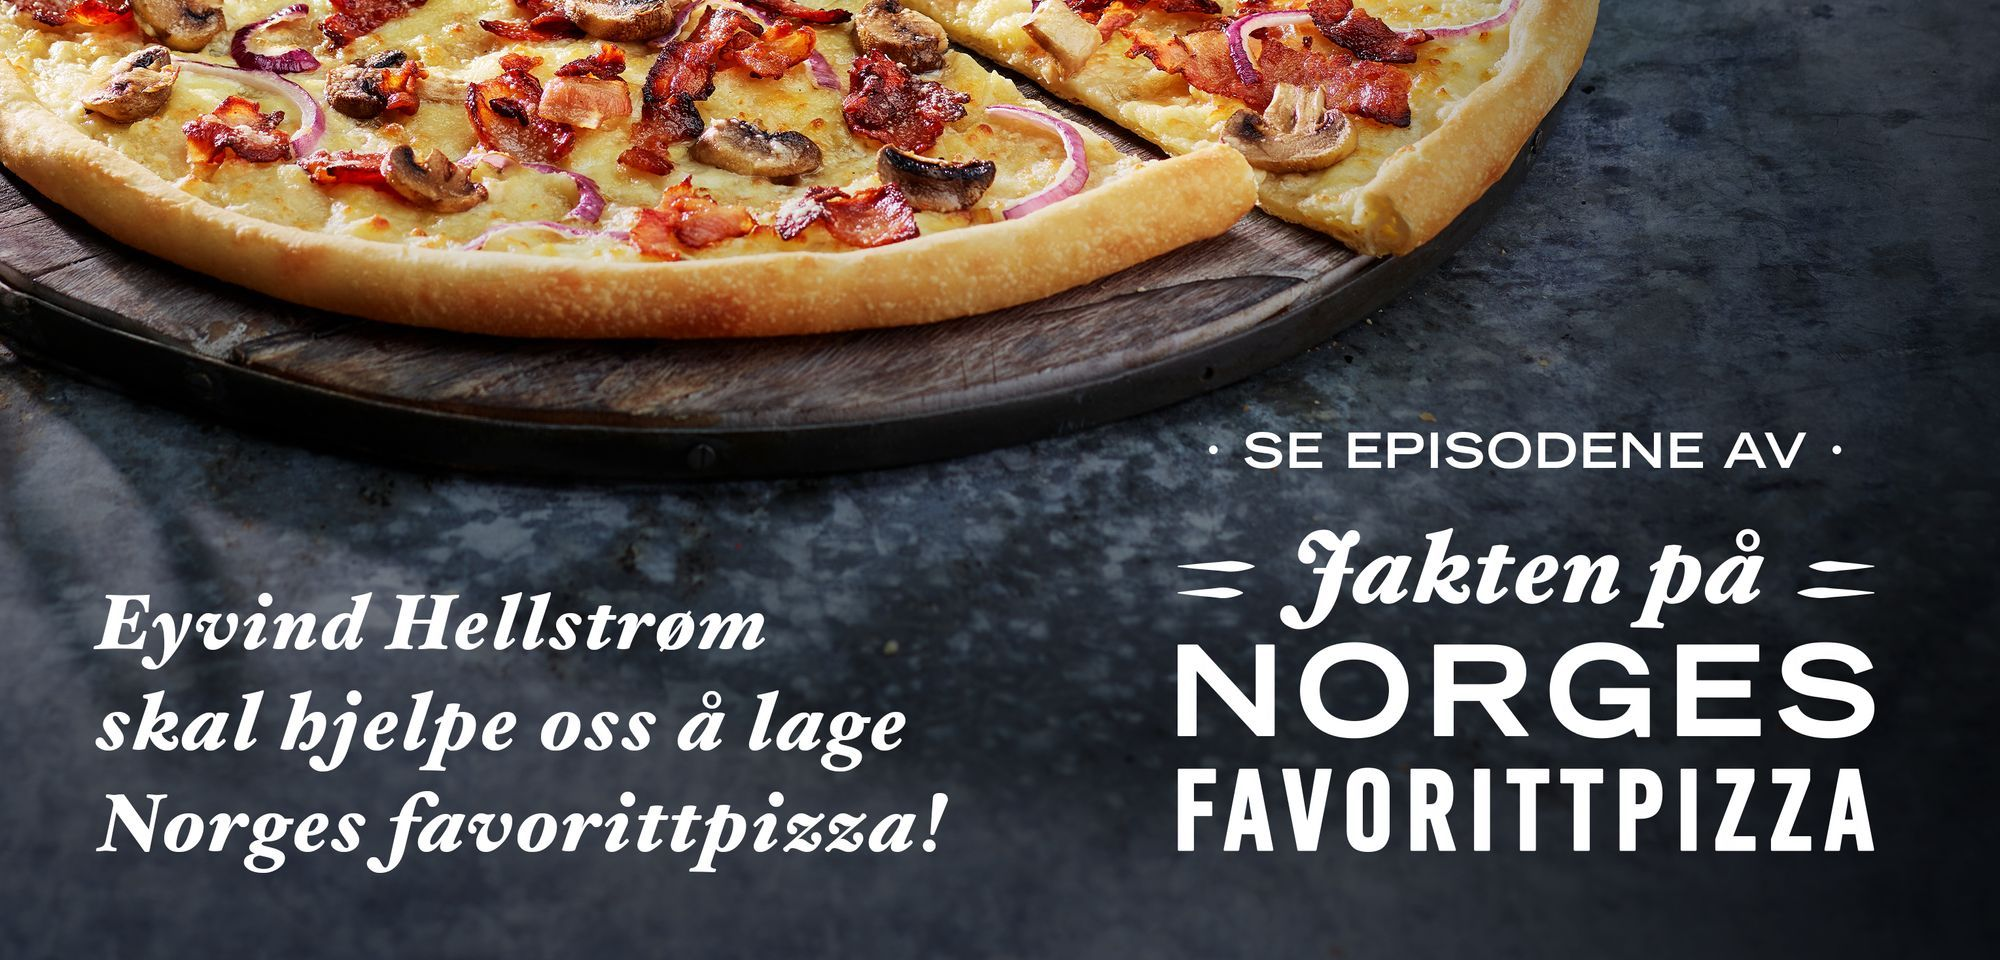 Norges Favorittpizza